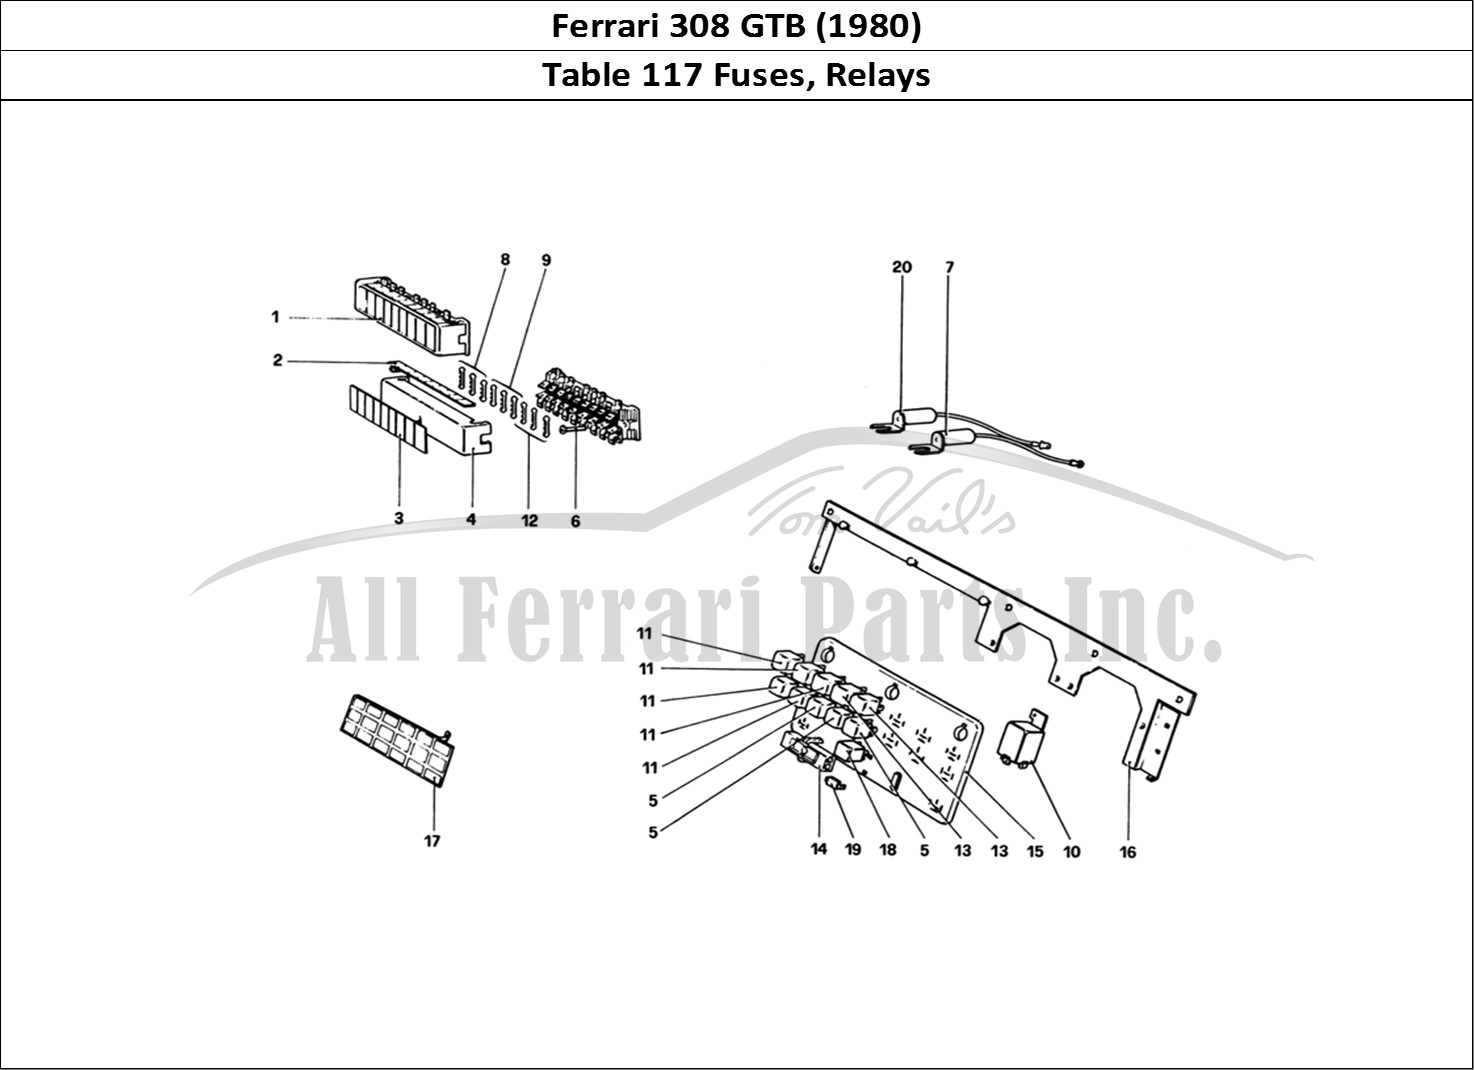 Buy original Ferrari 308 GTB (1980) 117 Fuses, Relays